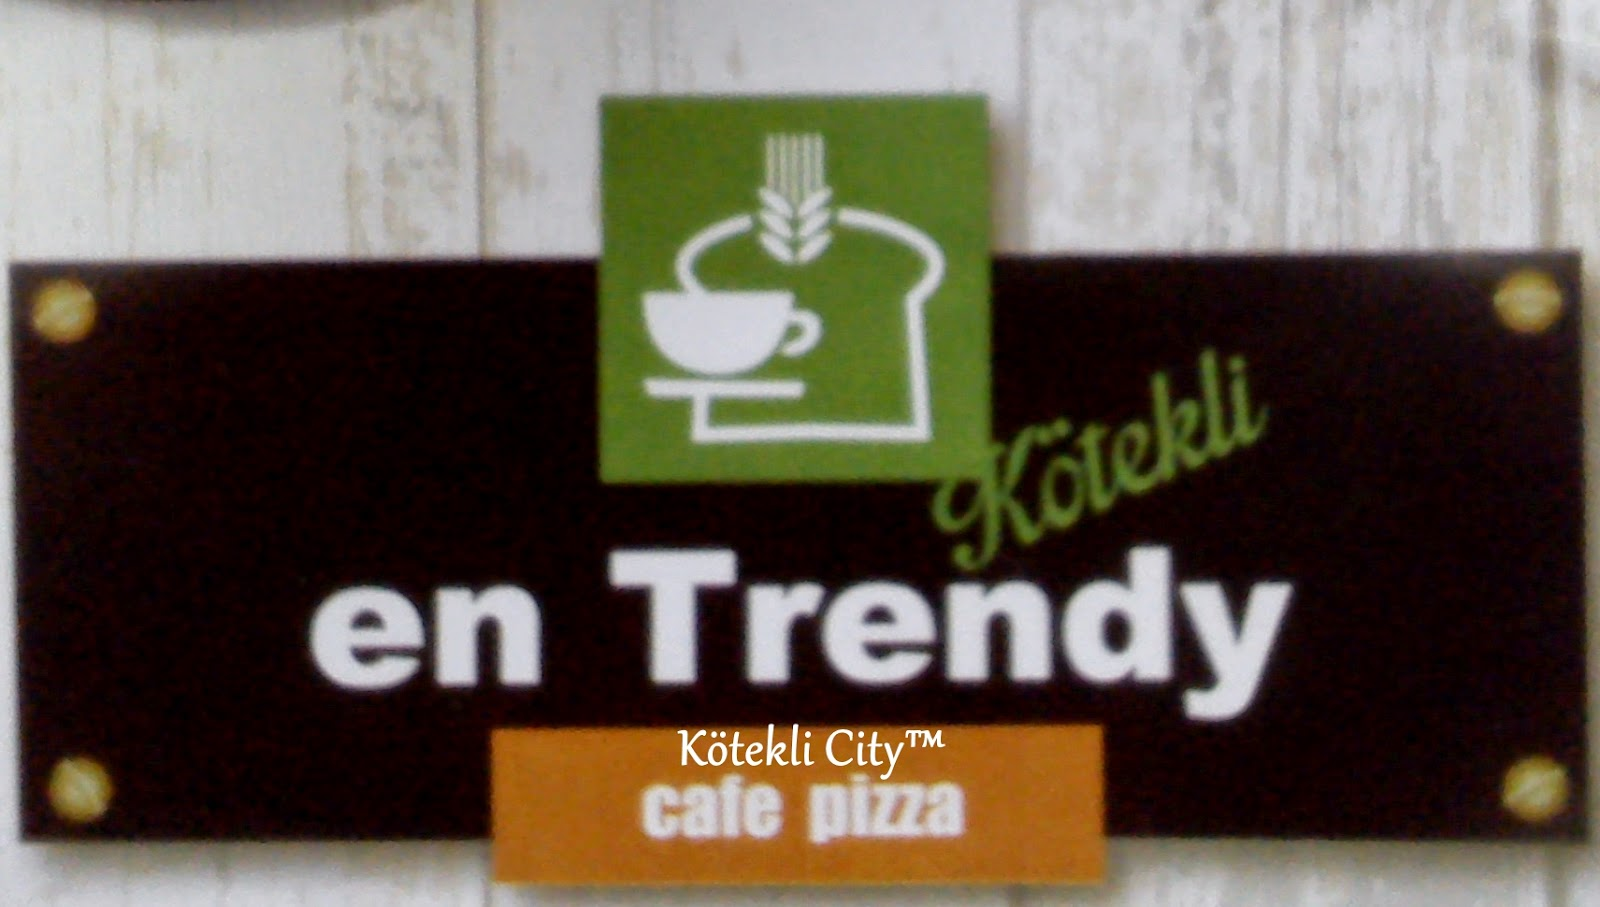 En Trendy Fast Food Pizza  Kötekli Menteşe Muğla